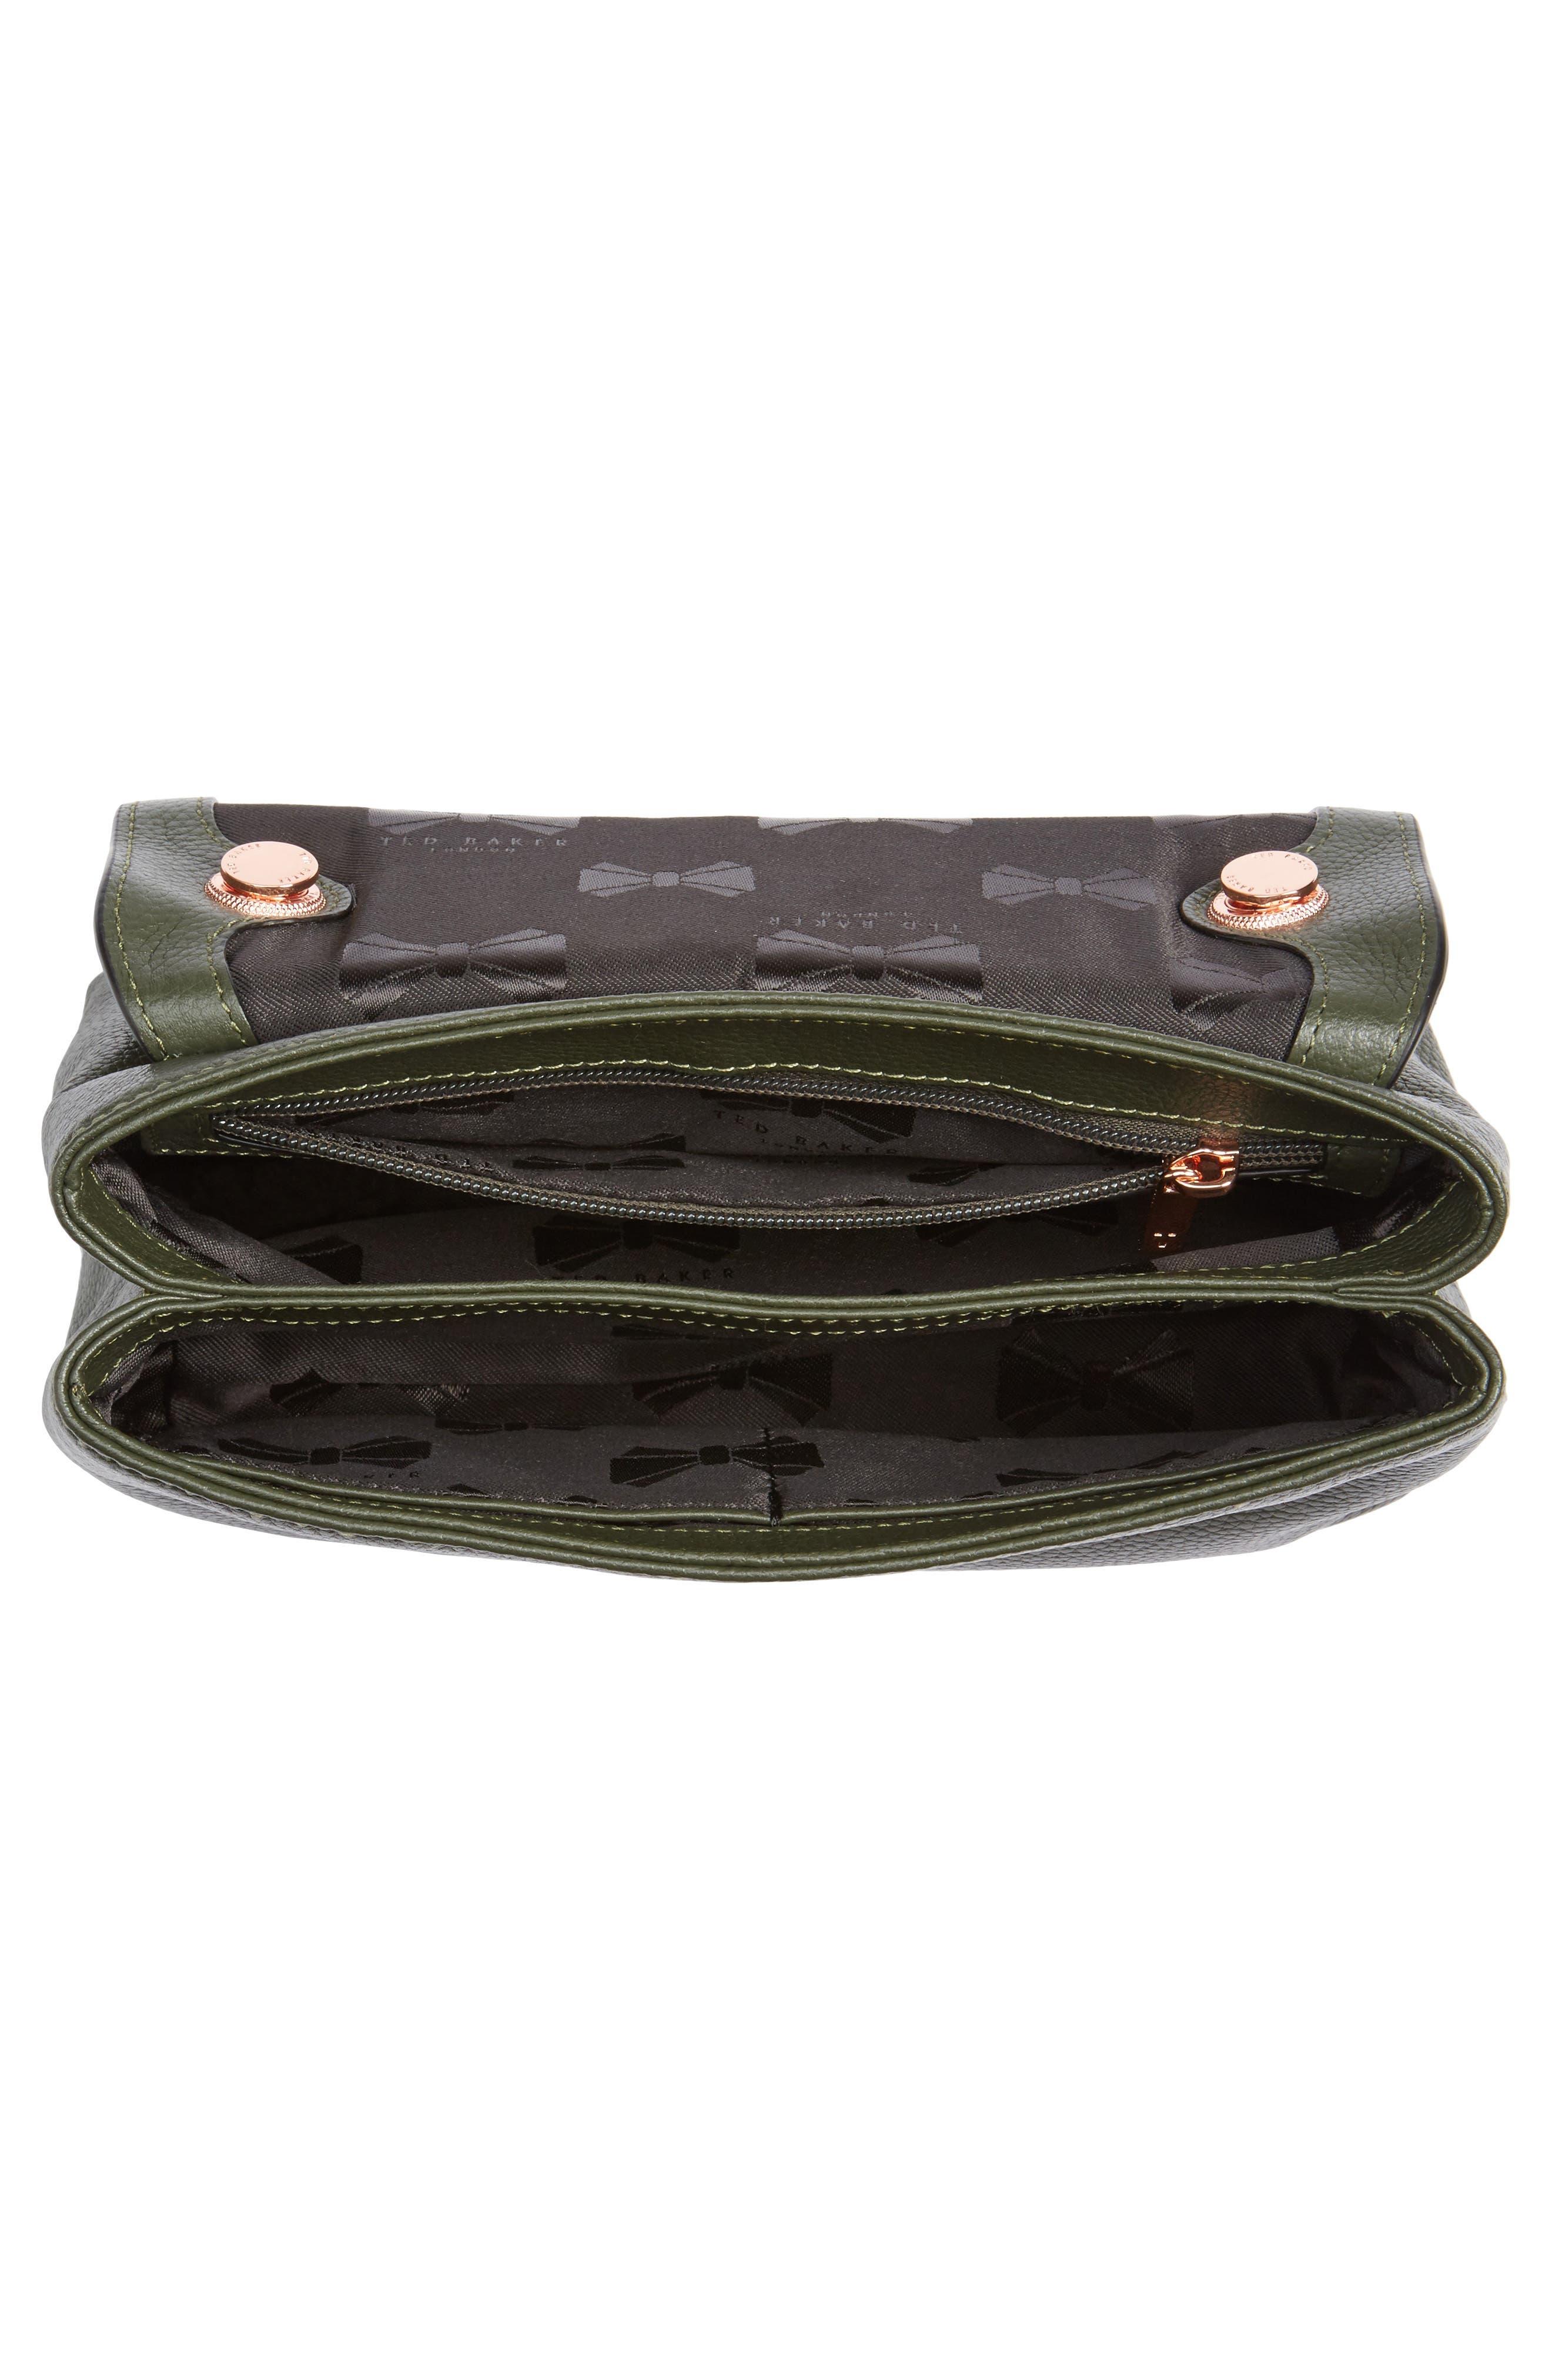 Sorikai Leather & Suede Crossbody Bag,                             Alternate thumbnail 4, color,                             312